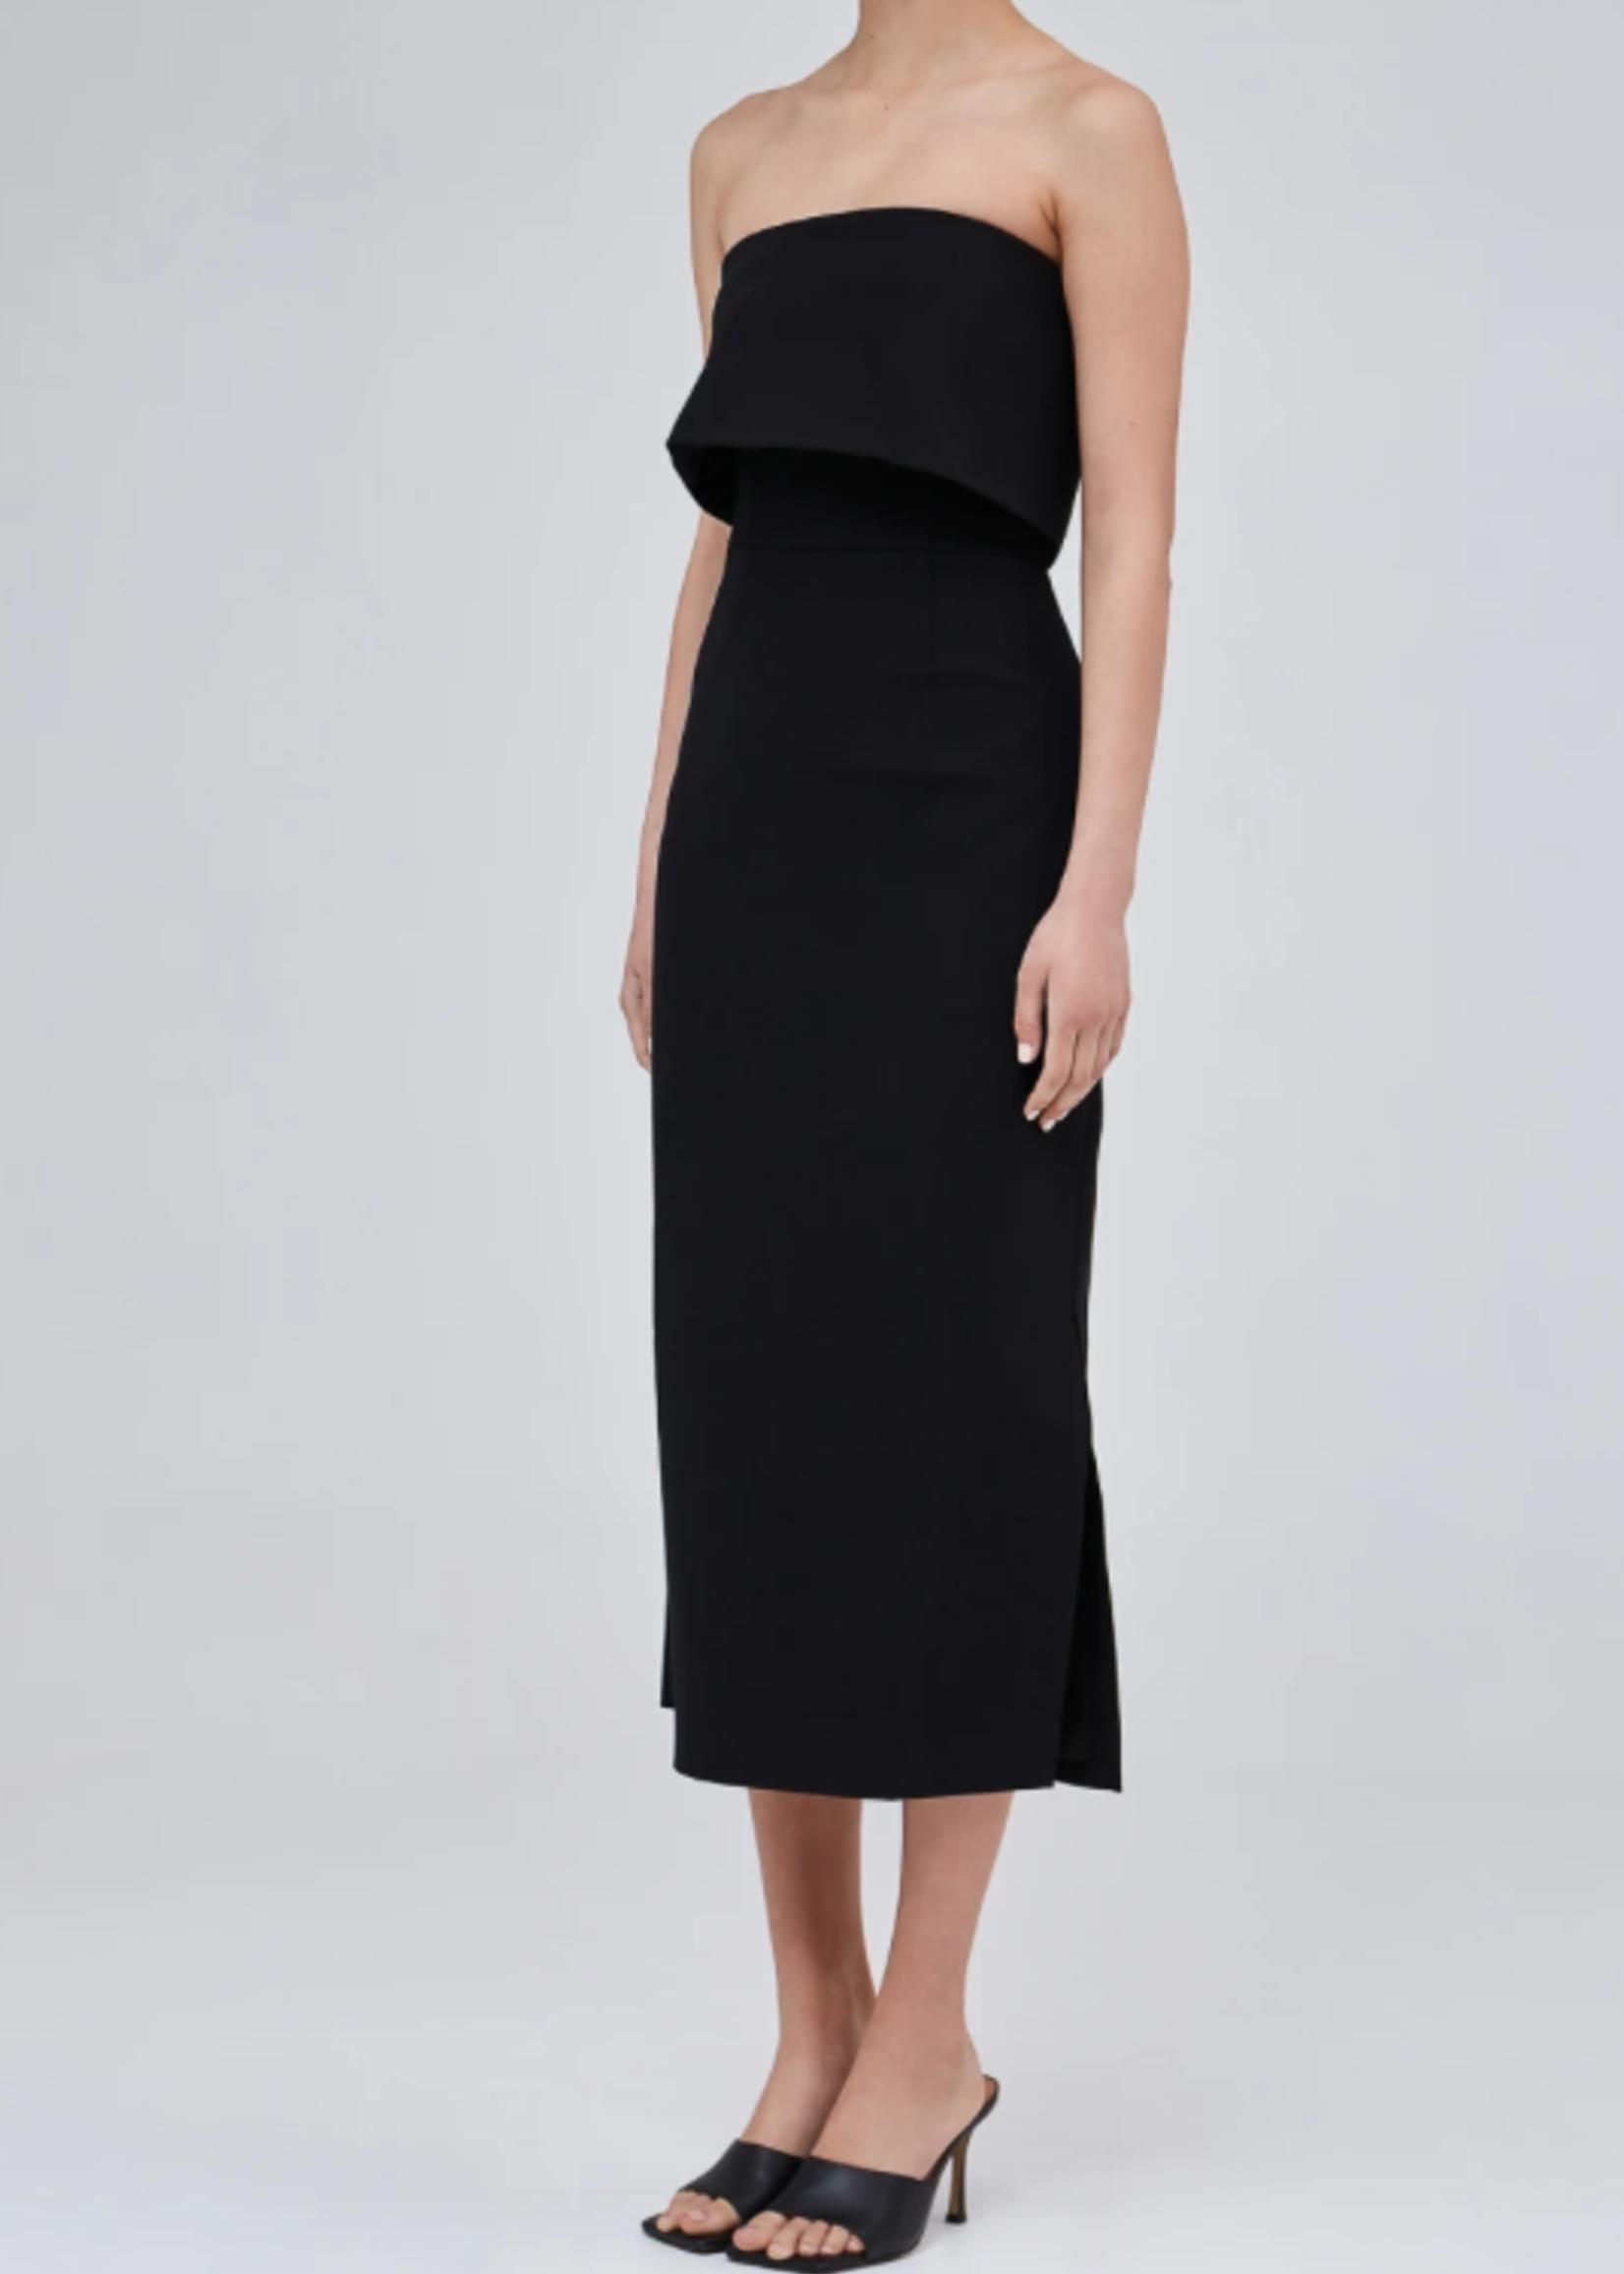 Elitaire Boutique Mesmerising Midi Dress